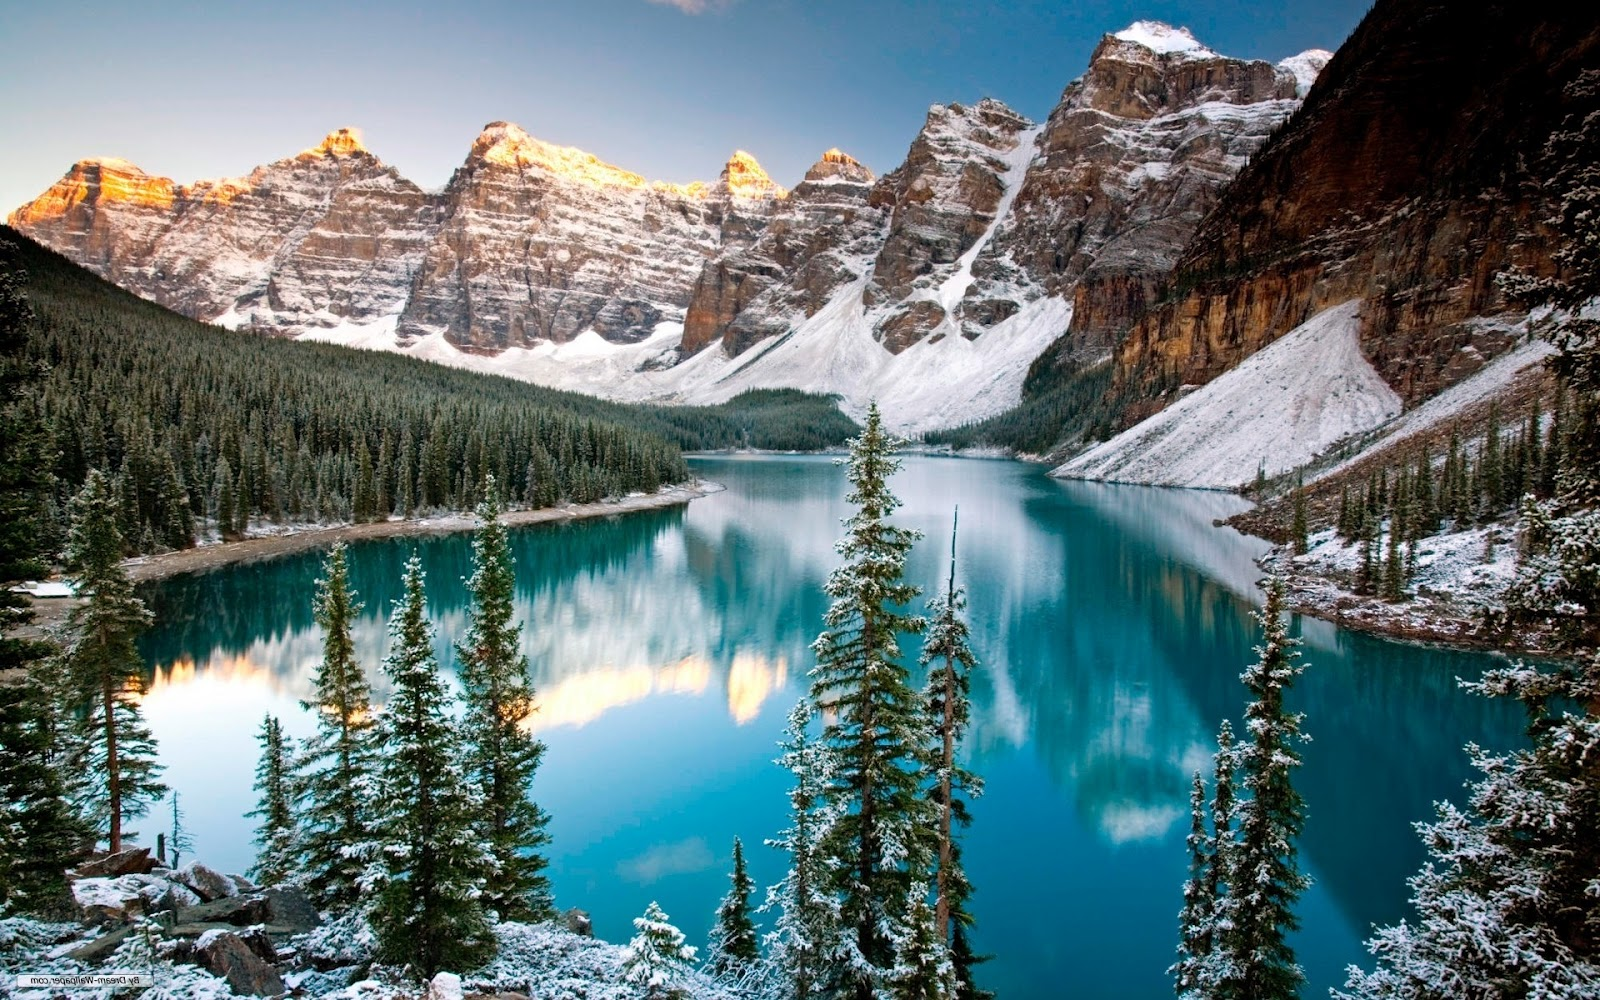 Winter mountain screensavers and wallpaper wallpapersafari - Mountain screensavers free ...